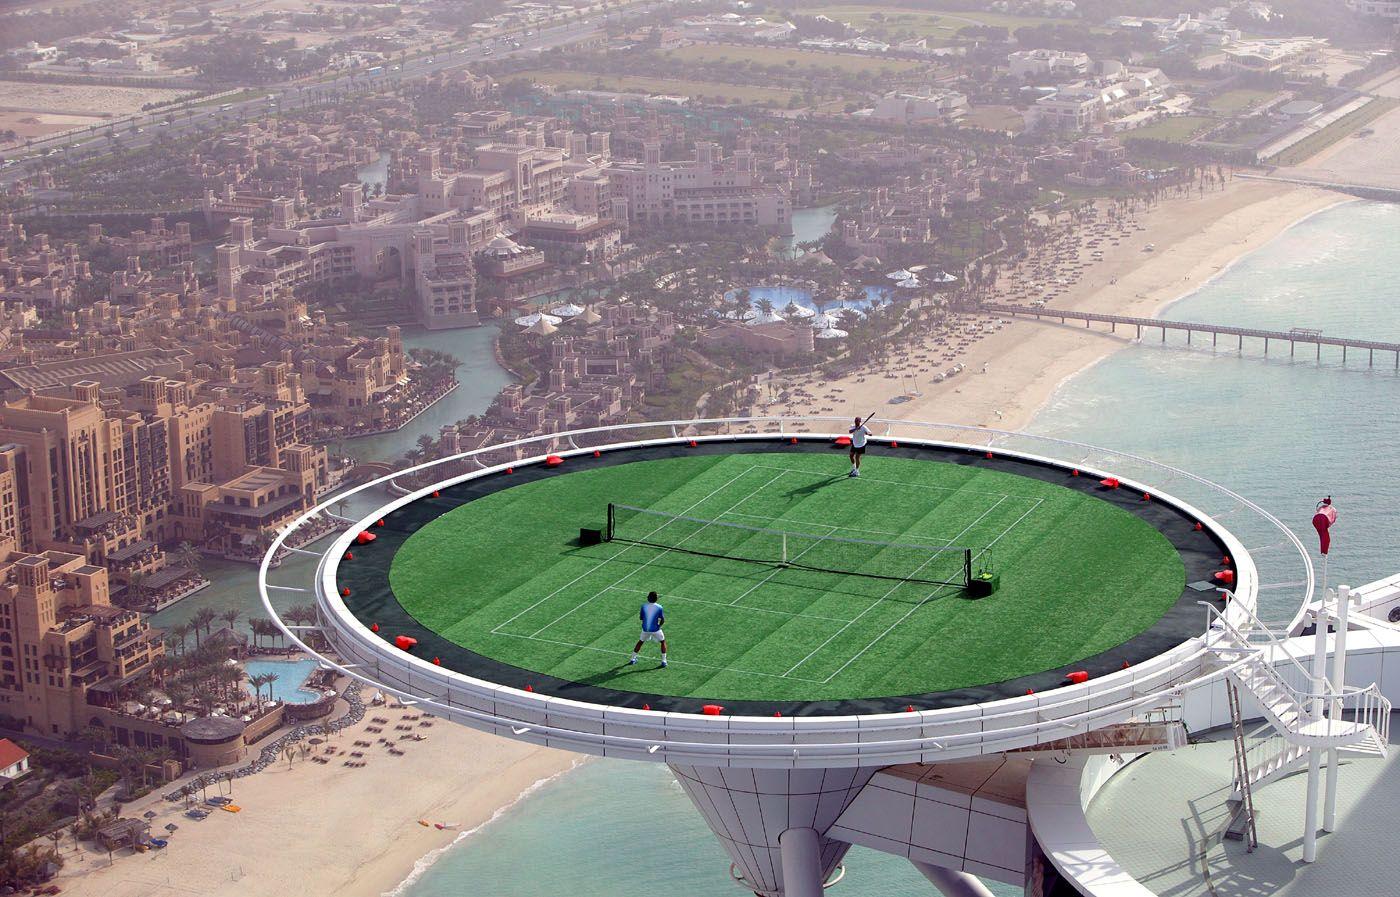 Dubai Hq Hd Top Wallpapers Free Download 1080p Fine Hd